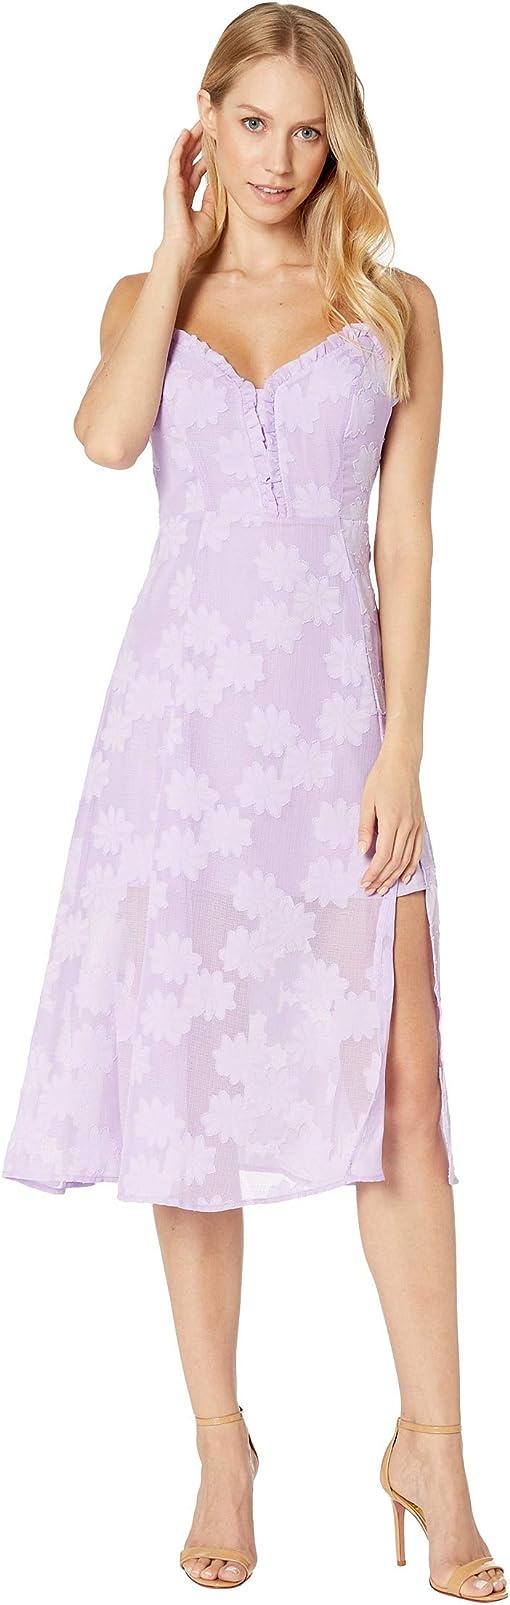 Lavender Shadow